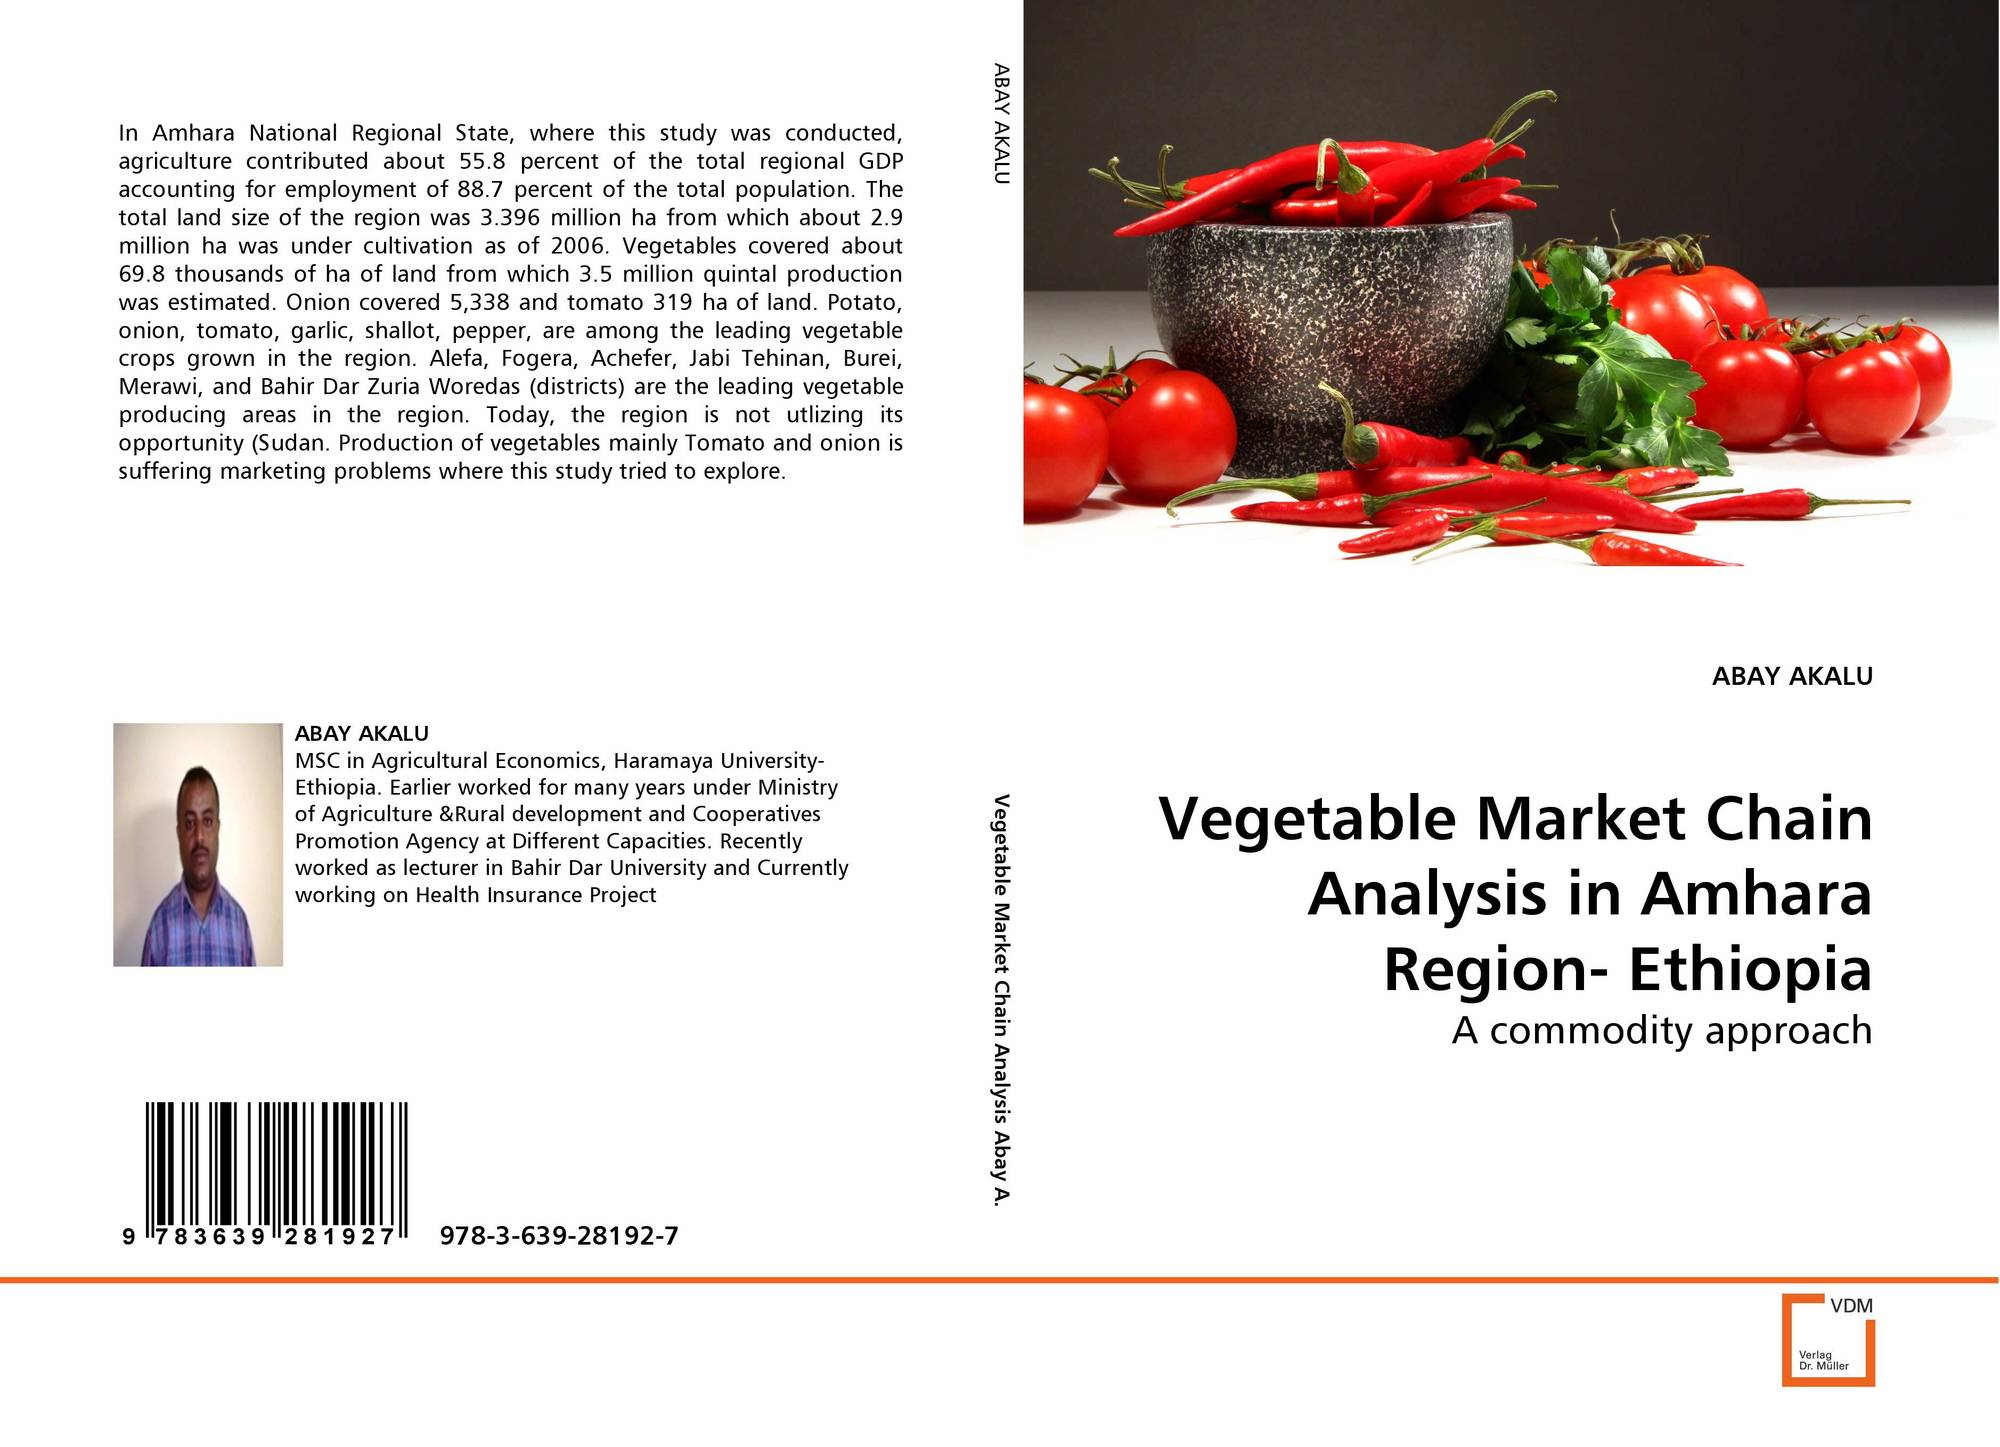 Vegetable Market Chain Analysis in Amhara Region- Ethiopia